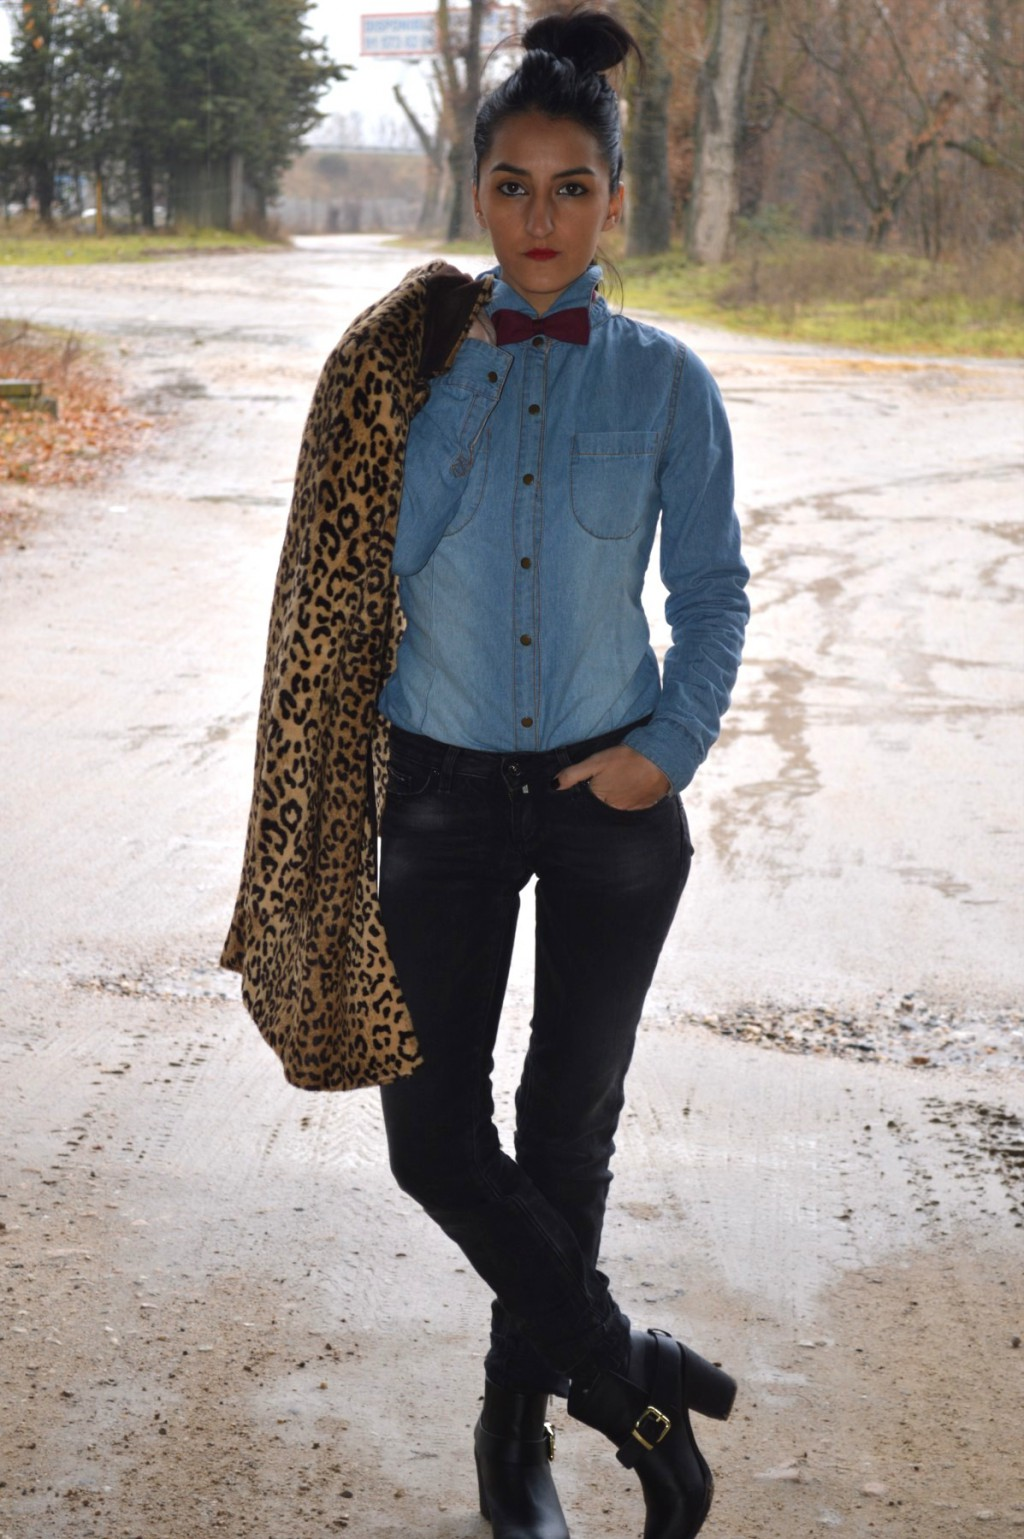 Abrigo / coat: Mango outlet (New) Camisa / shirt: Stradivarius (old) Jeans: Salsa Jeans Botines / booties: H&M Clutch: Stradivarius Pajarita / bow tie: H&M Man